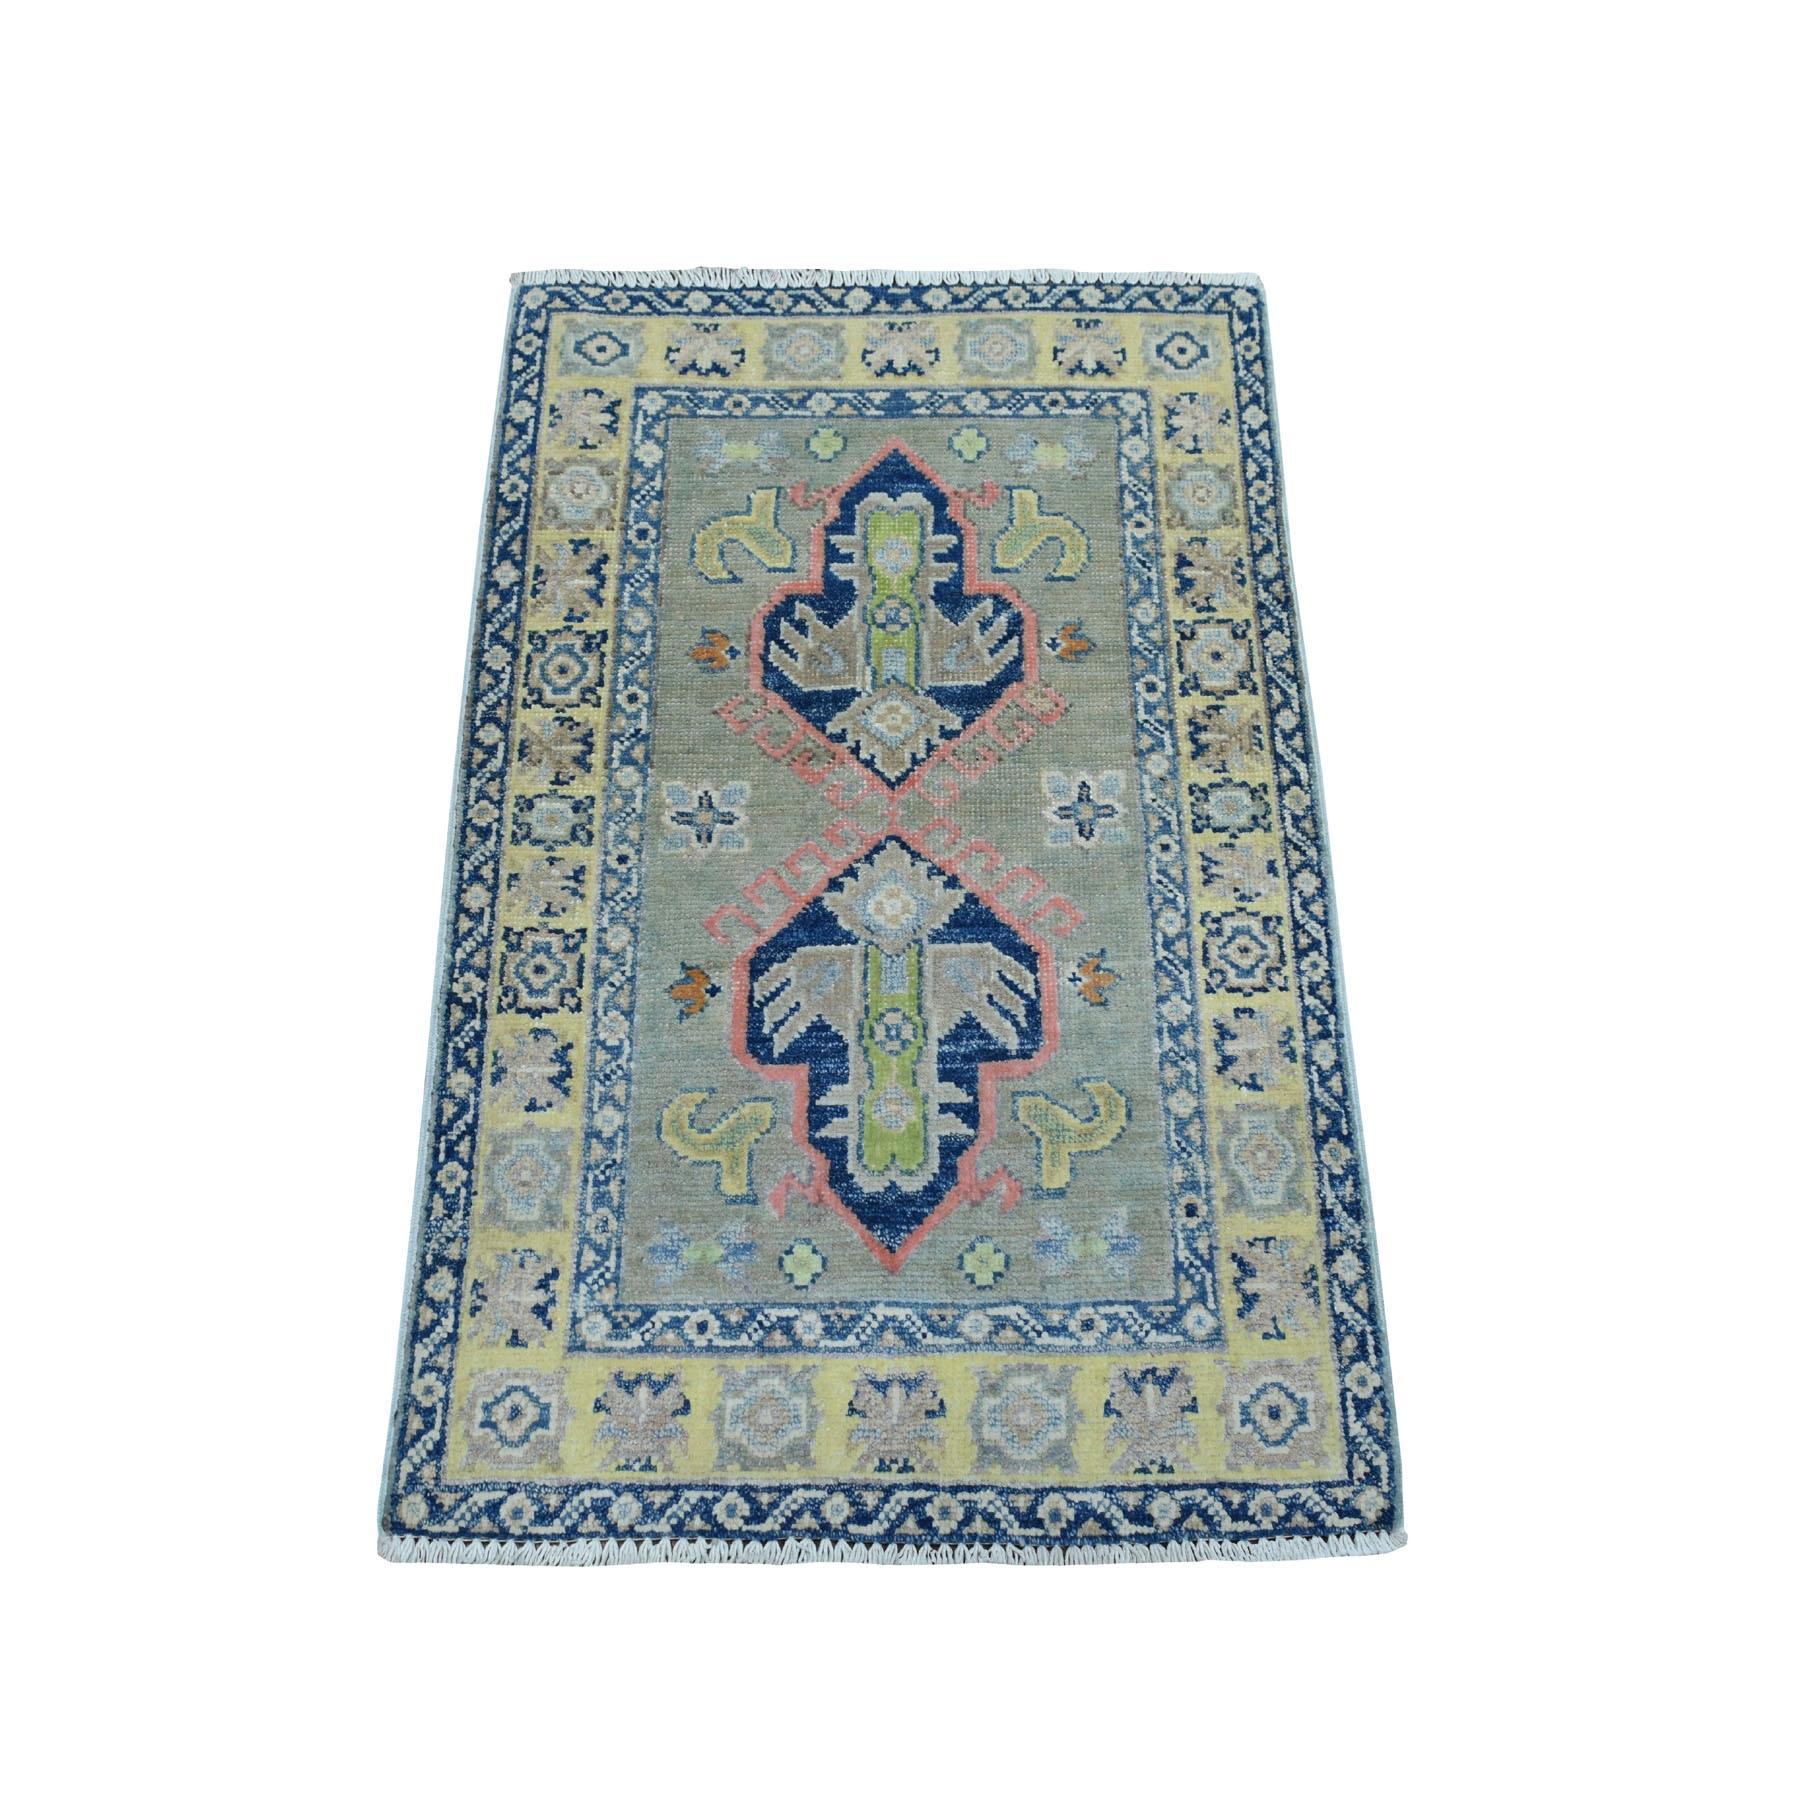 2'X3' Colorful Gray Fusion Kazak Pure Wool Geometric Design Hand Knotted Oriental Rug moaebc86